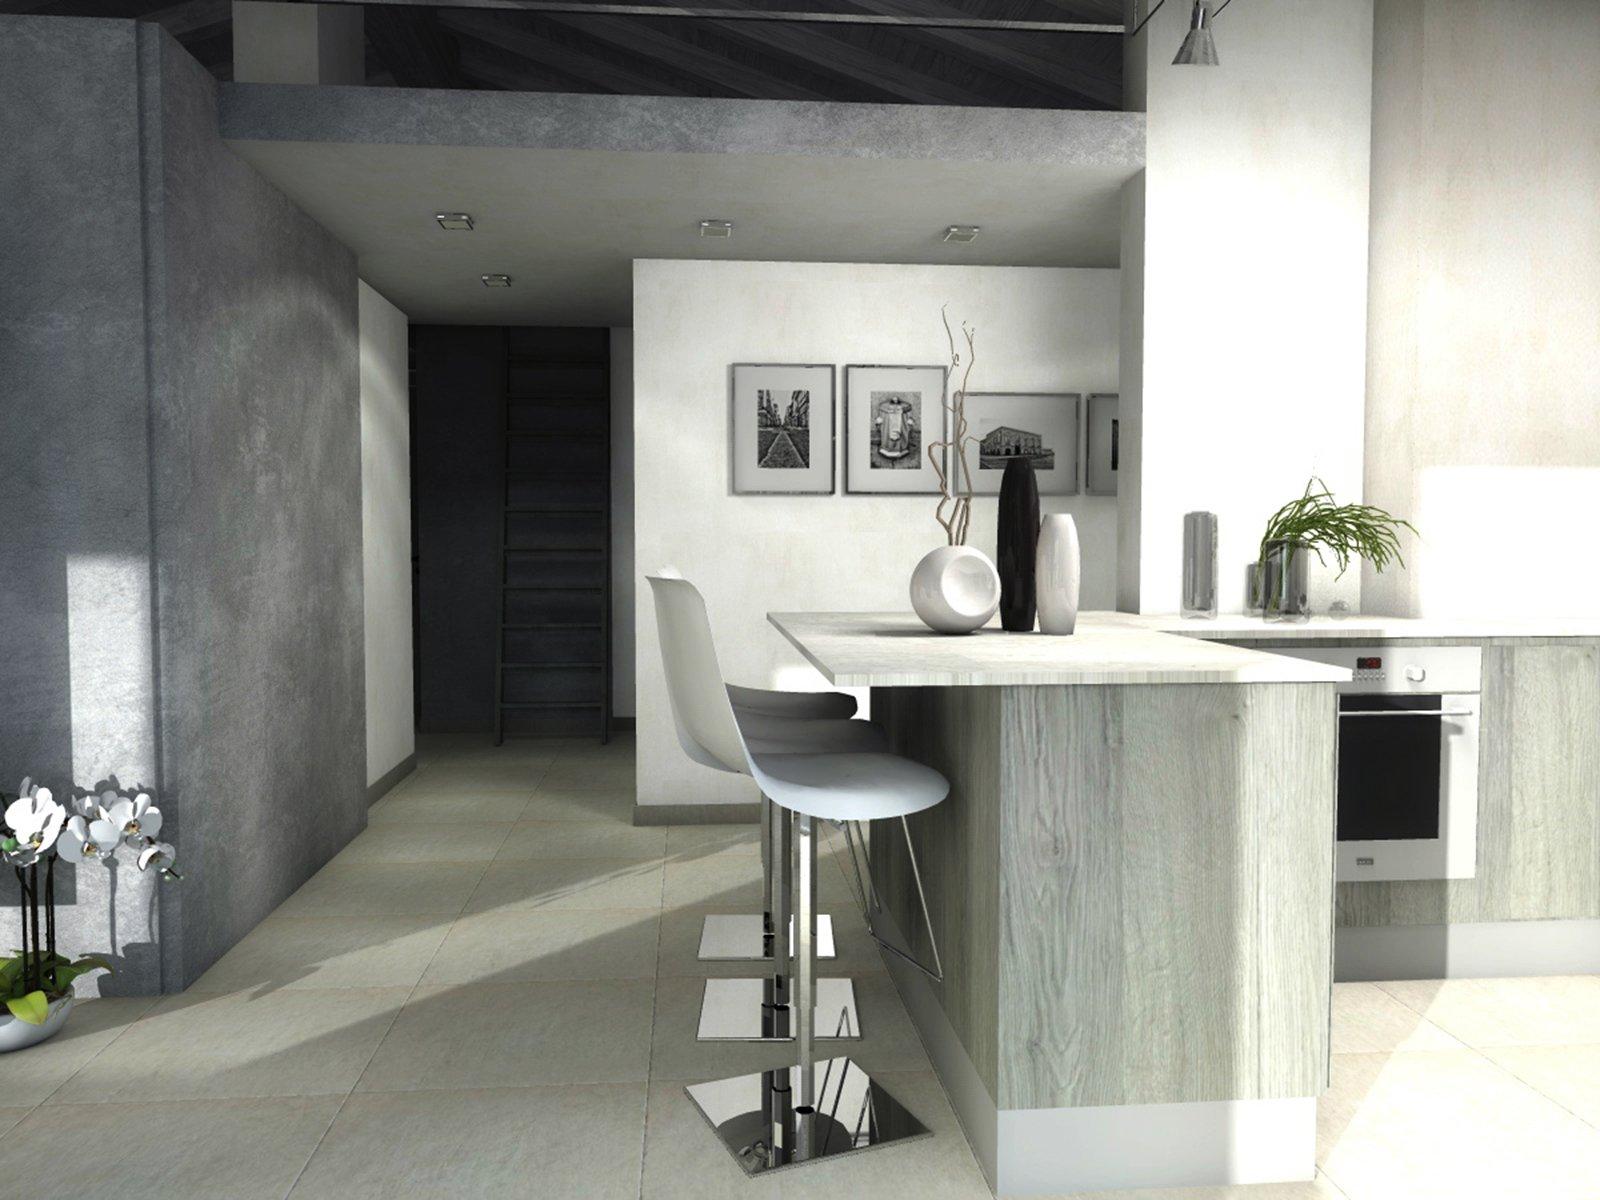 Casa Mansarda Cucina Bancone Cose Di Casa #707457 1600 1200 Arredamento Cucina Piccola Nuova Costruzione